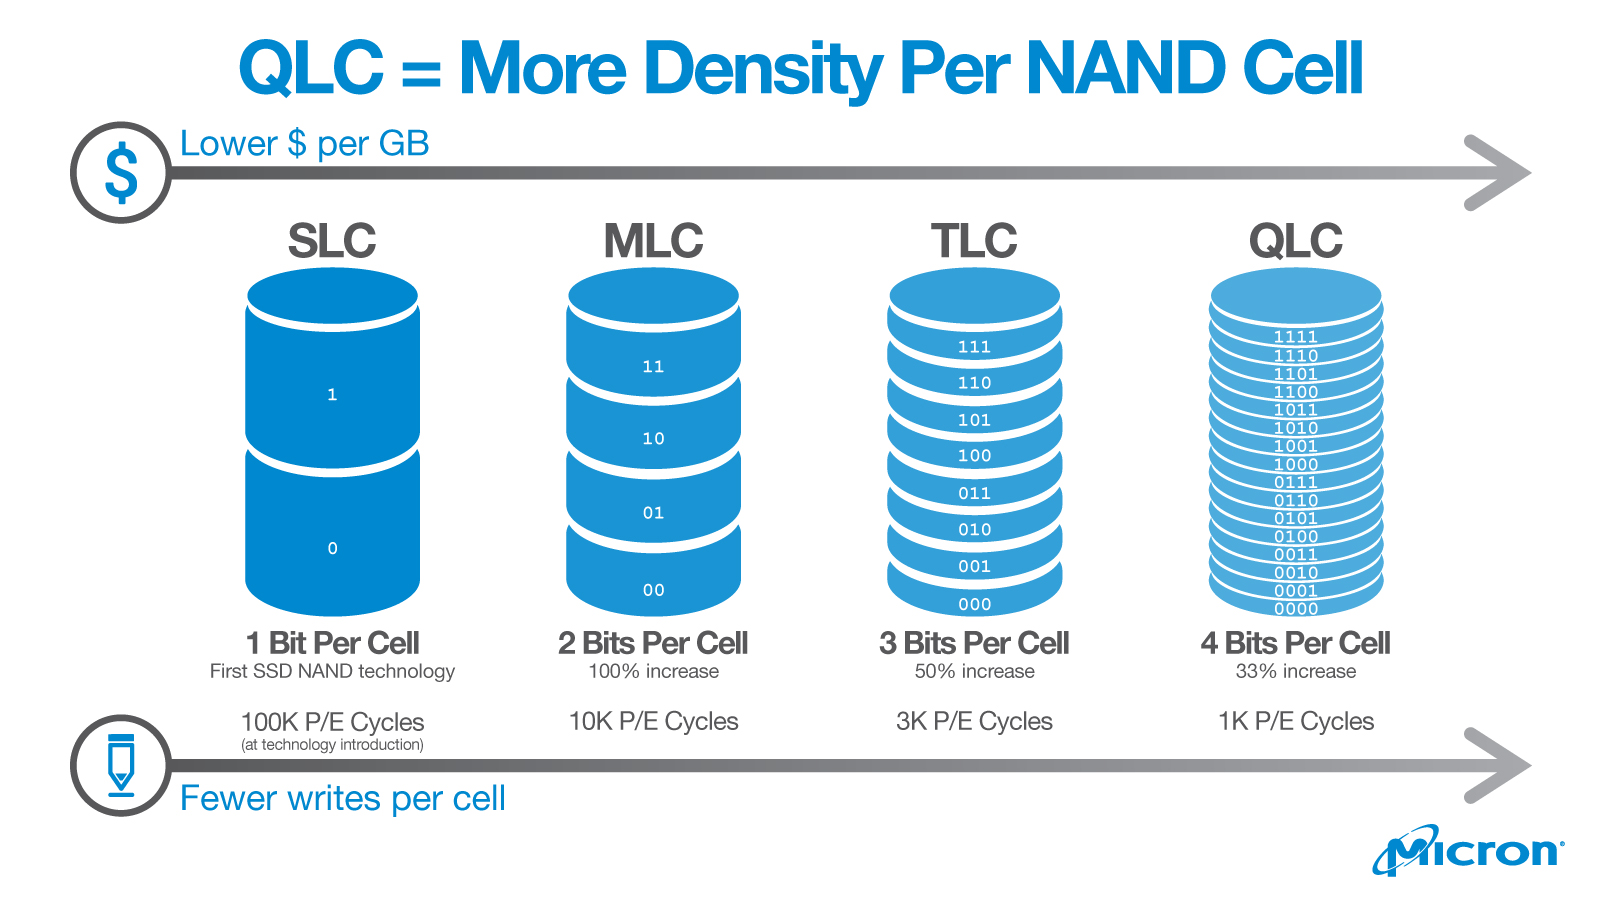 QLC NAND Density